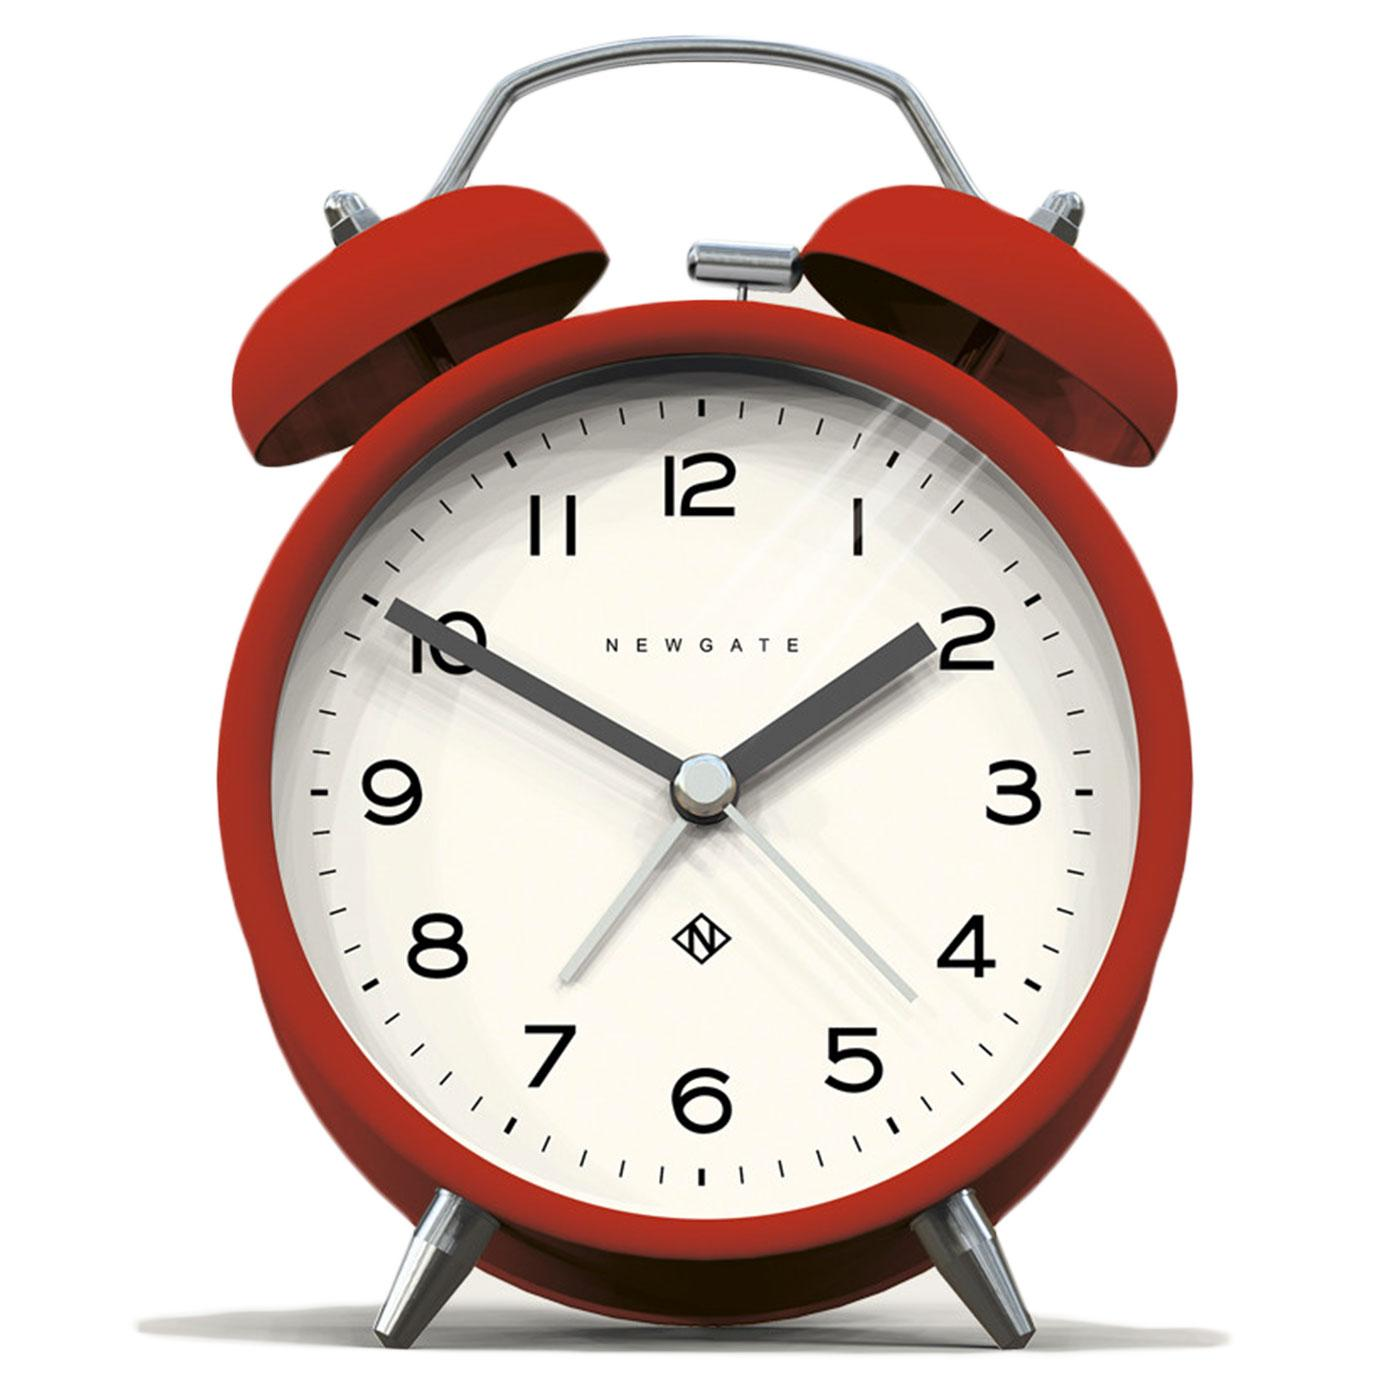 Echo NEWGATE CLOCKS Retro Bell Alarm Clock in Red